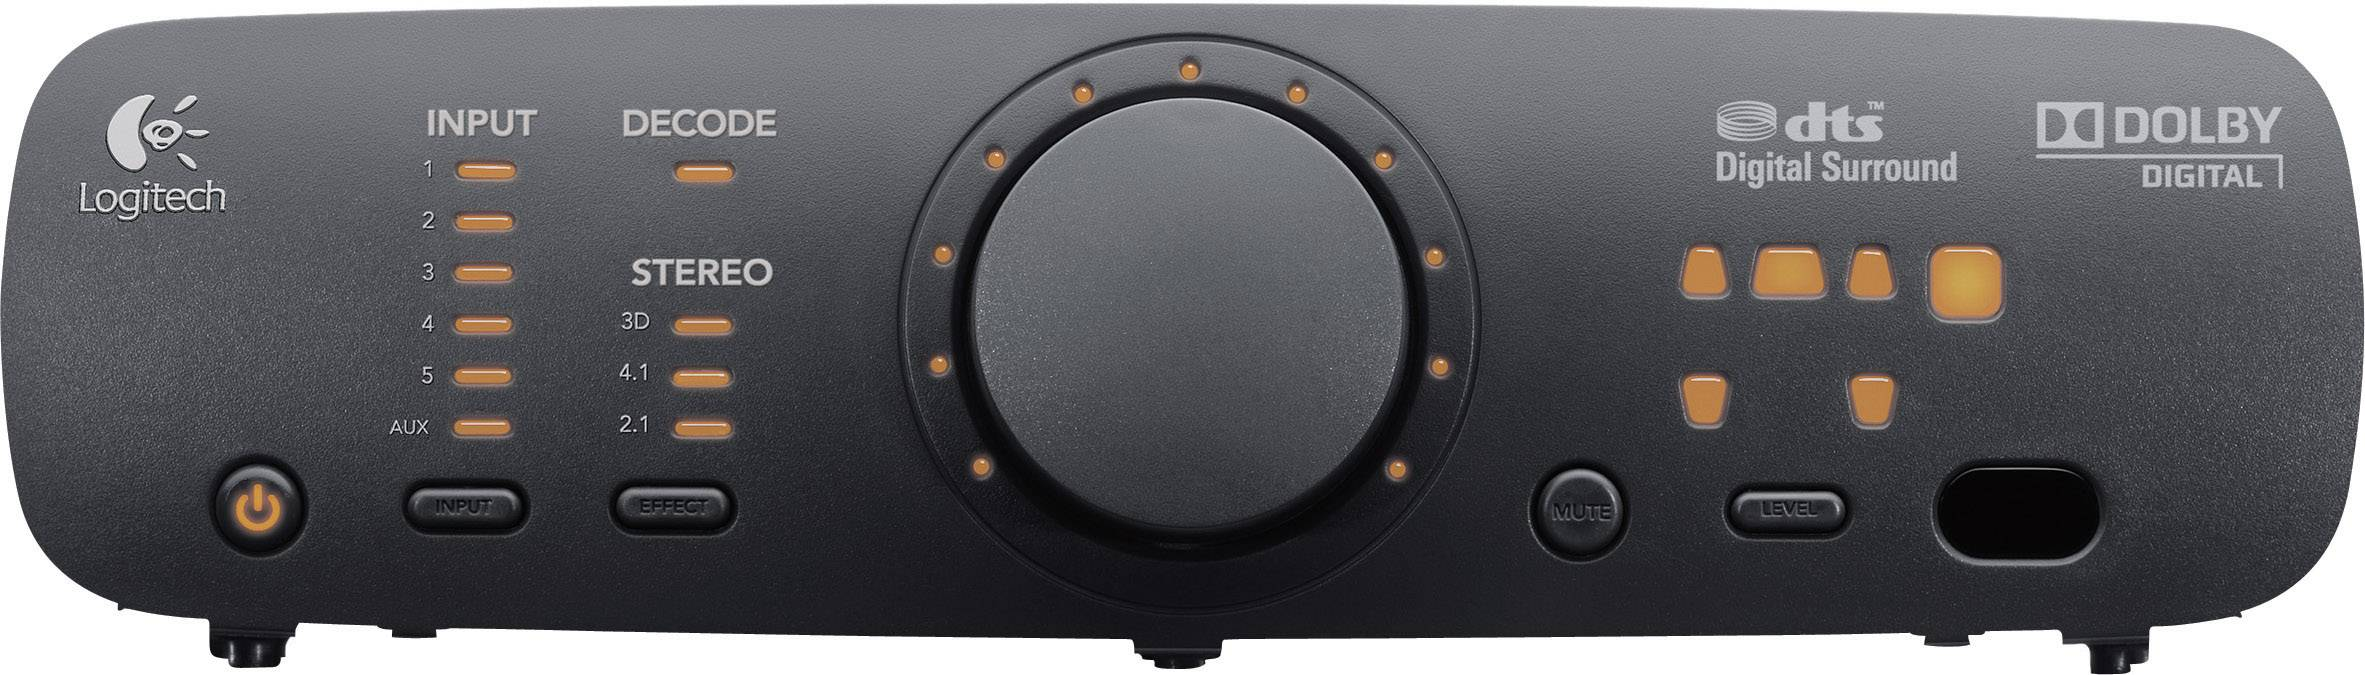 Reproduktory Logitech Z906 Surround 5.1